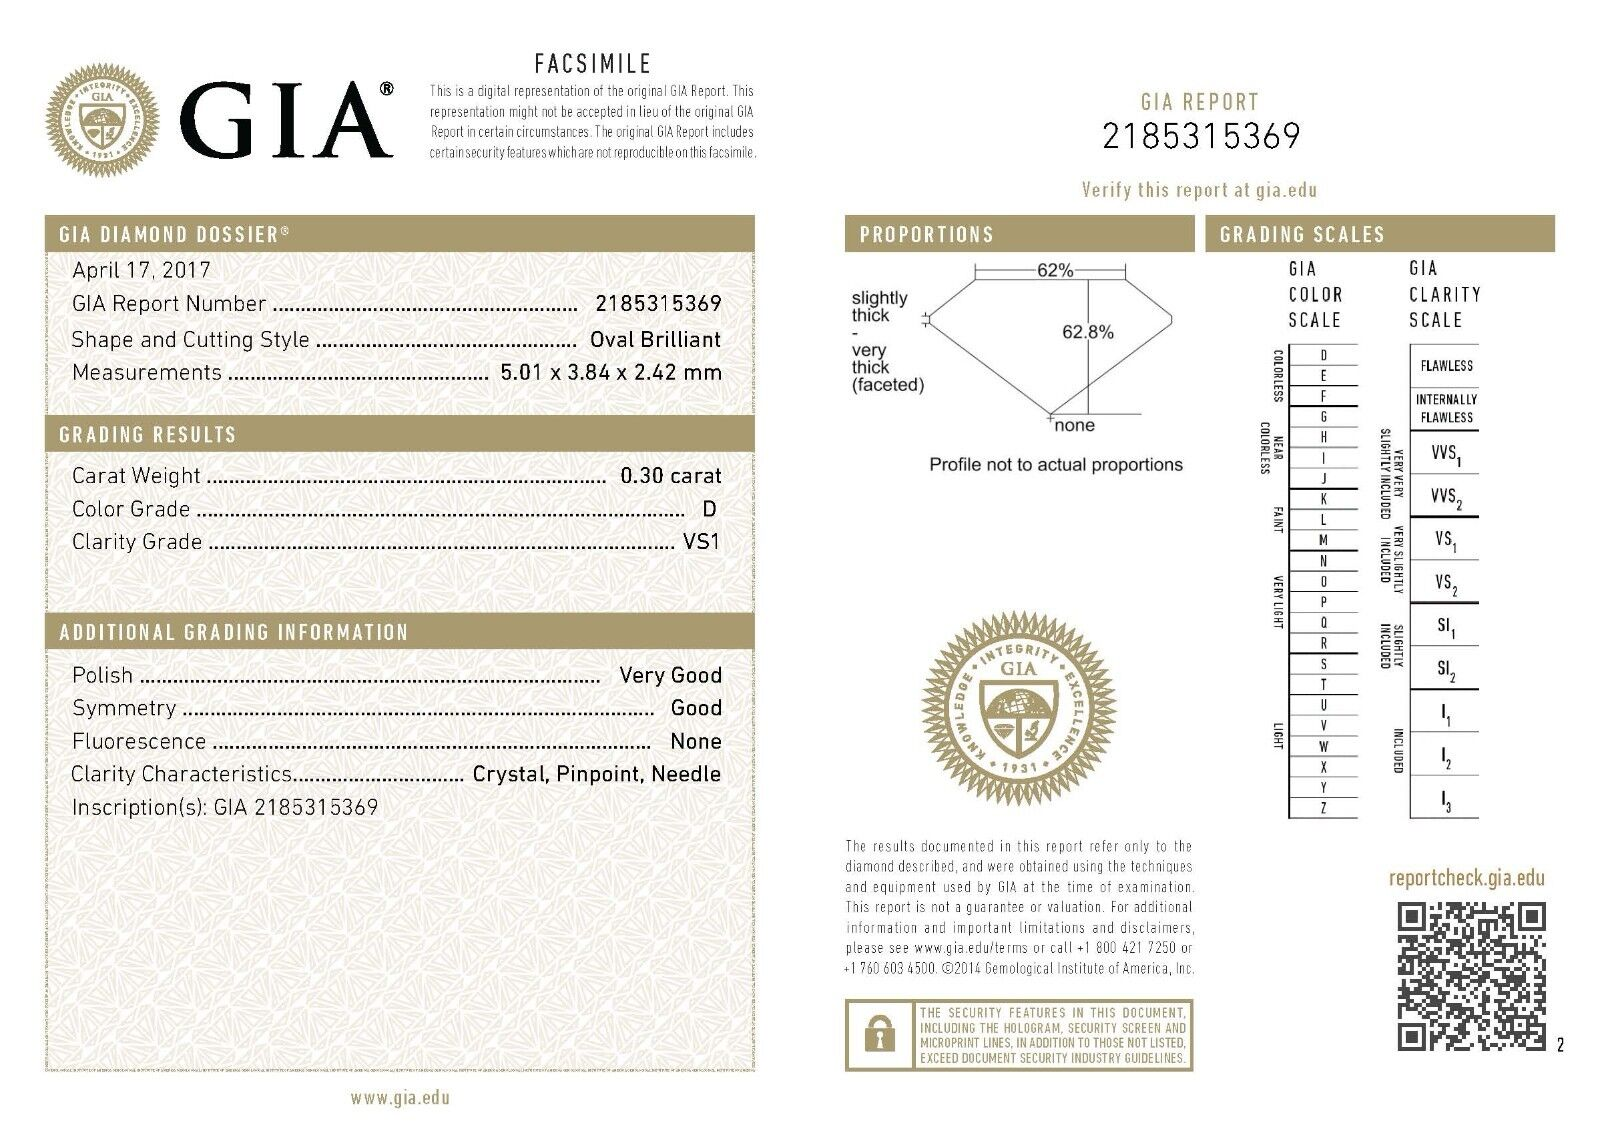 GIA loose diamond 0.30ct oval brilliant cut D VS1 5.01 x 3.84 x 2.42 mm NEW